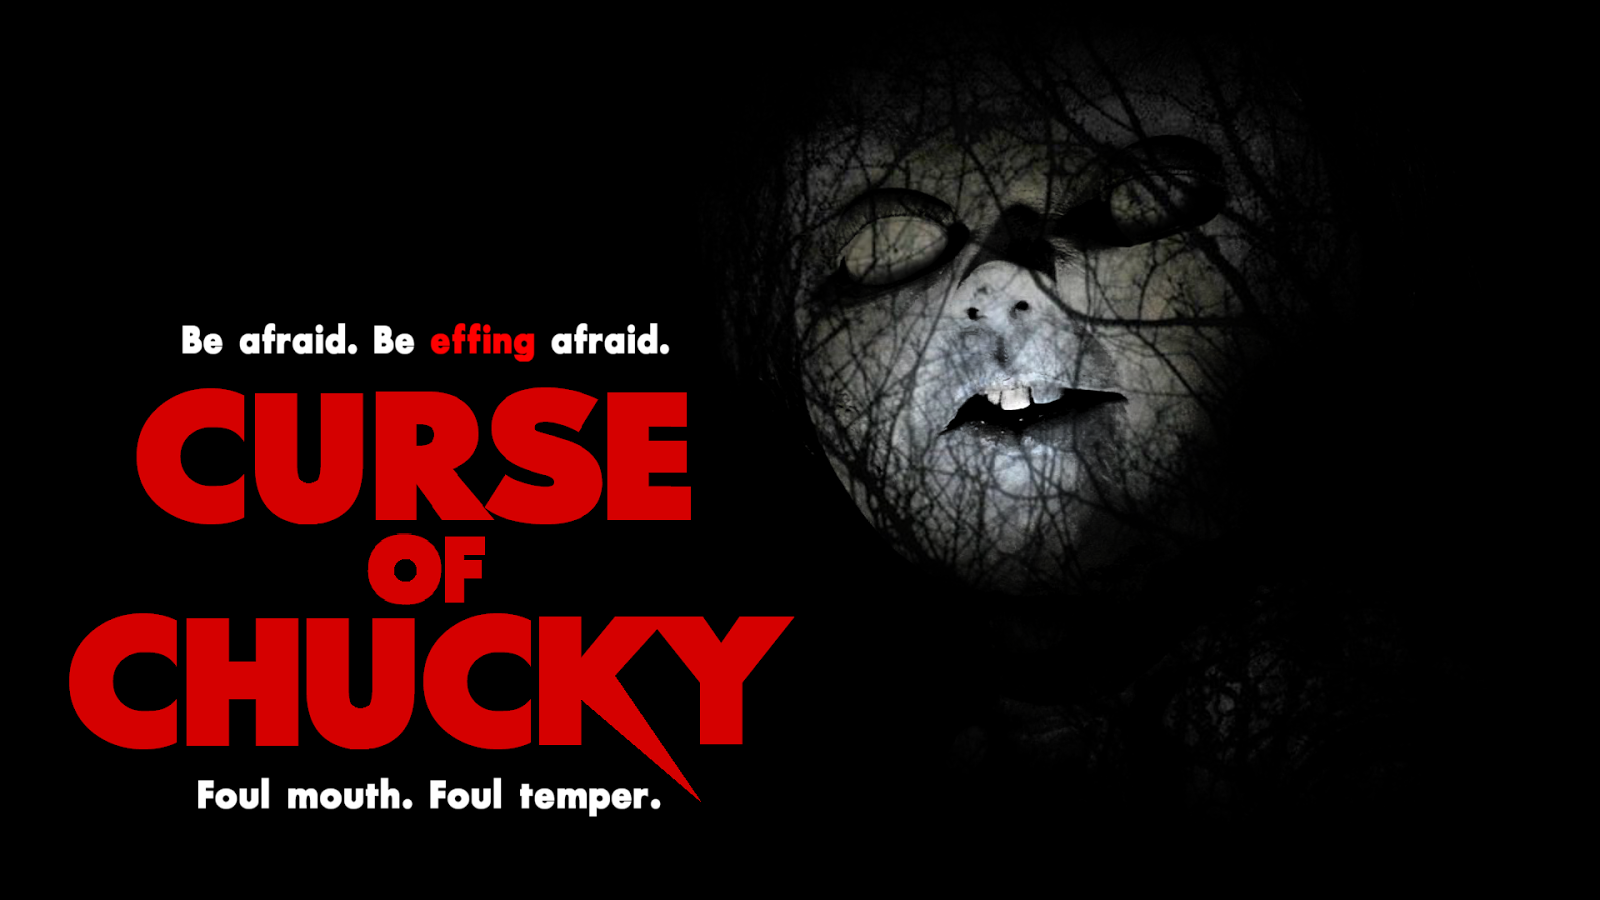 Film Online Curse Of Chucky 2013